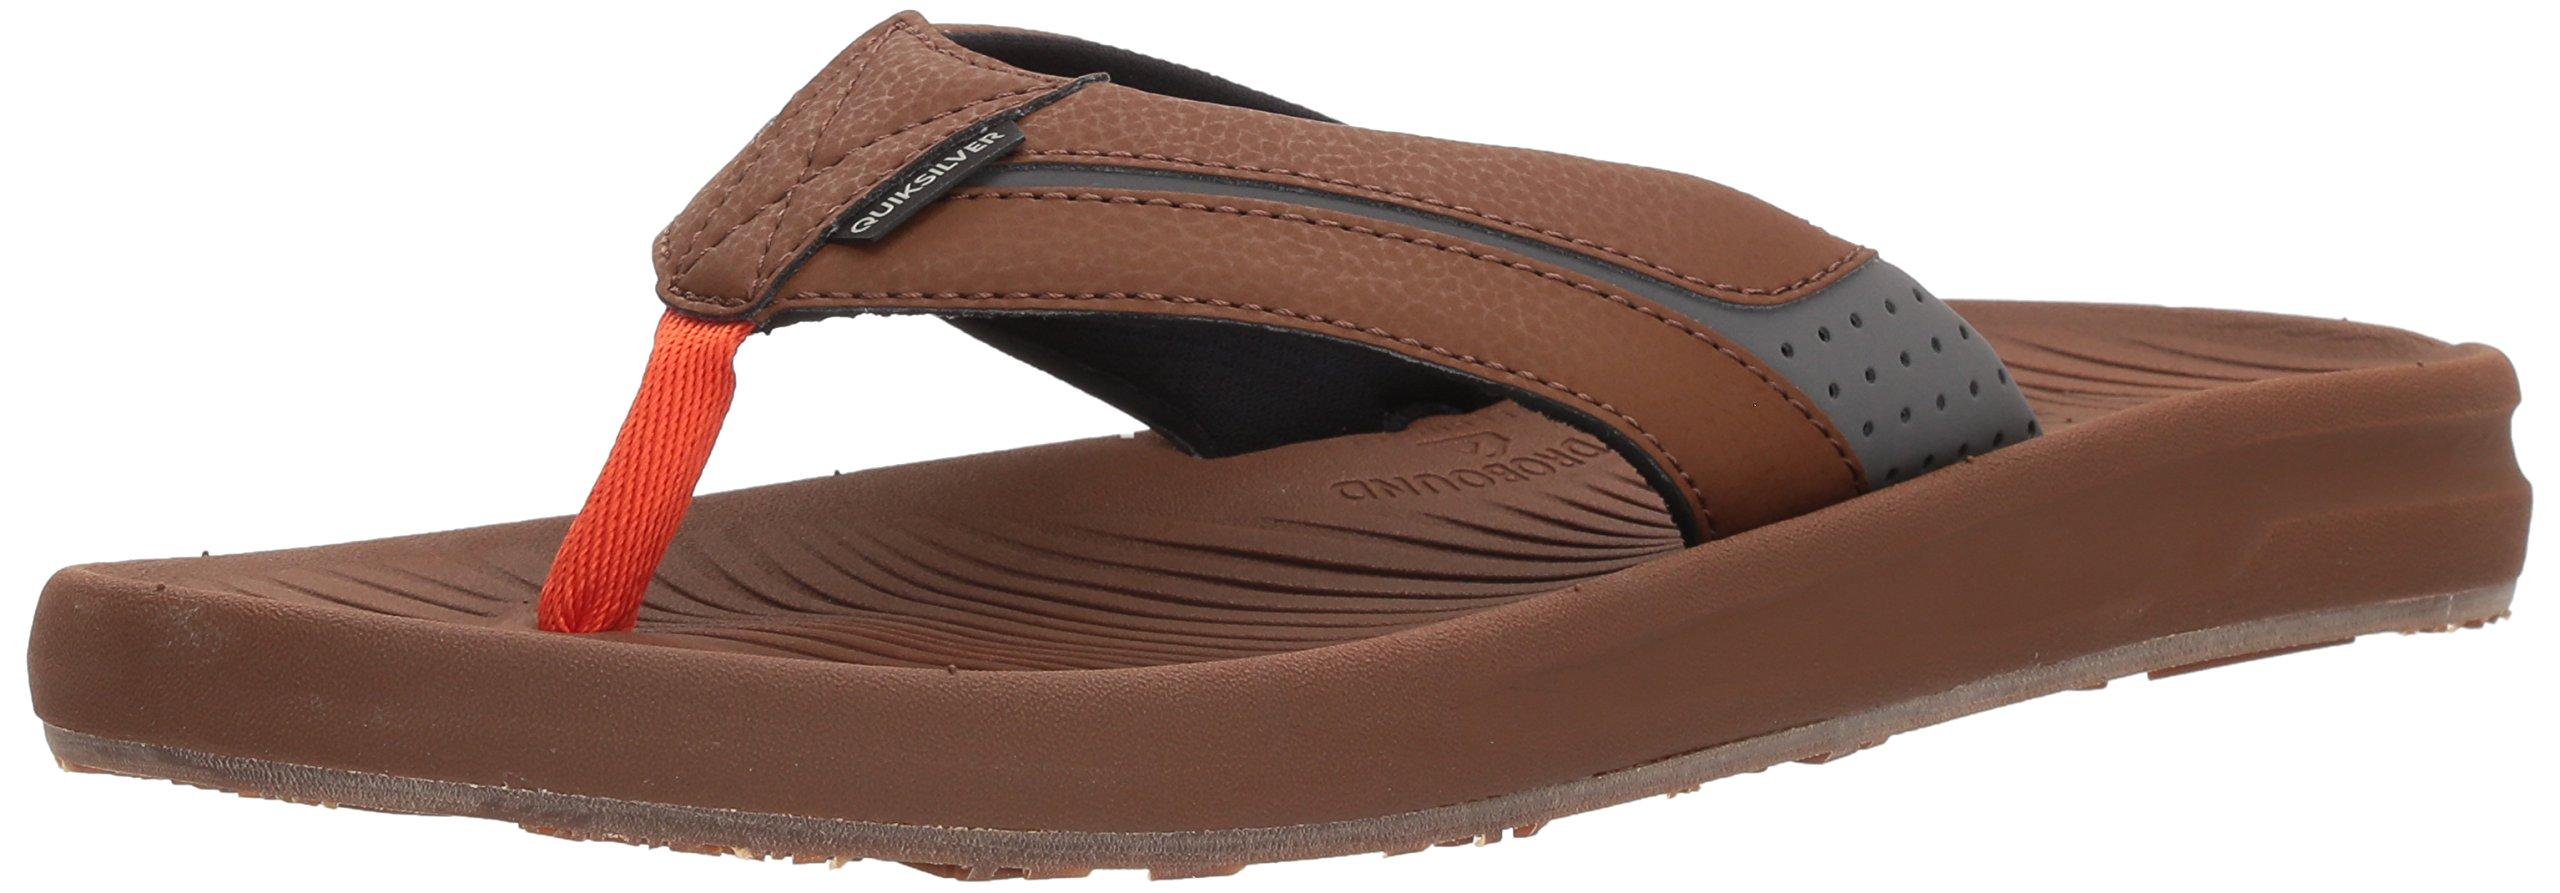 Quiksilver Men's Travel Oasis Sandal, Brown/Brown/Orange, 12 M US